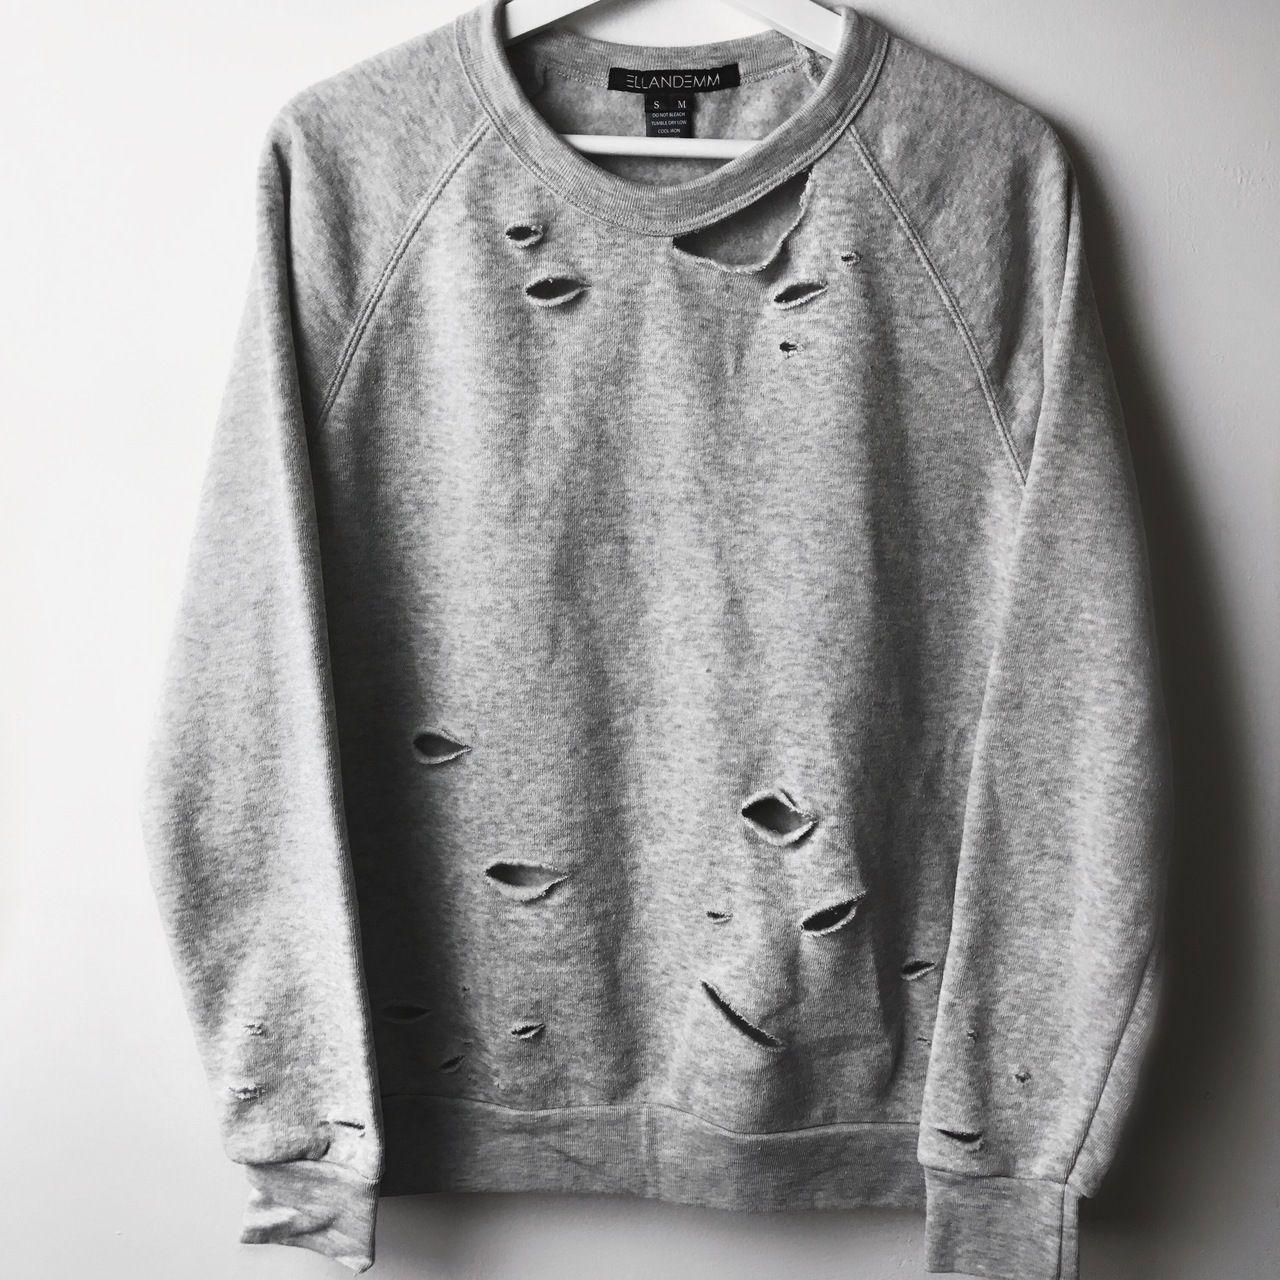 fd030bde43 EllandEmm - Distressed Sweatshirt - Oatmeal